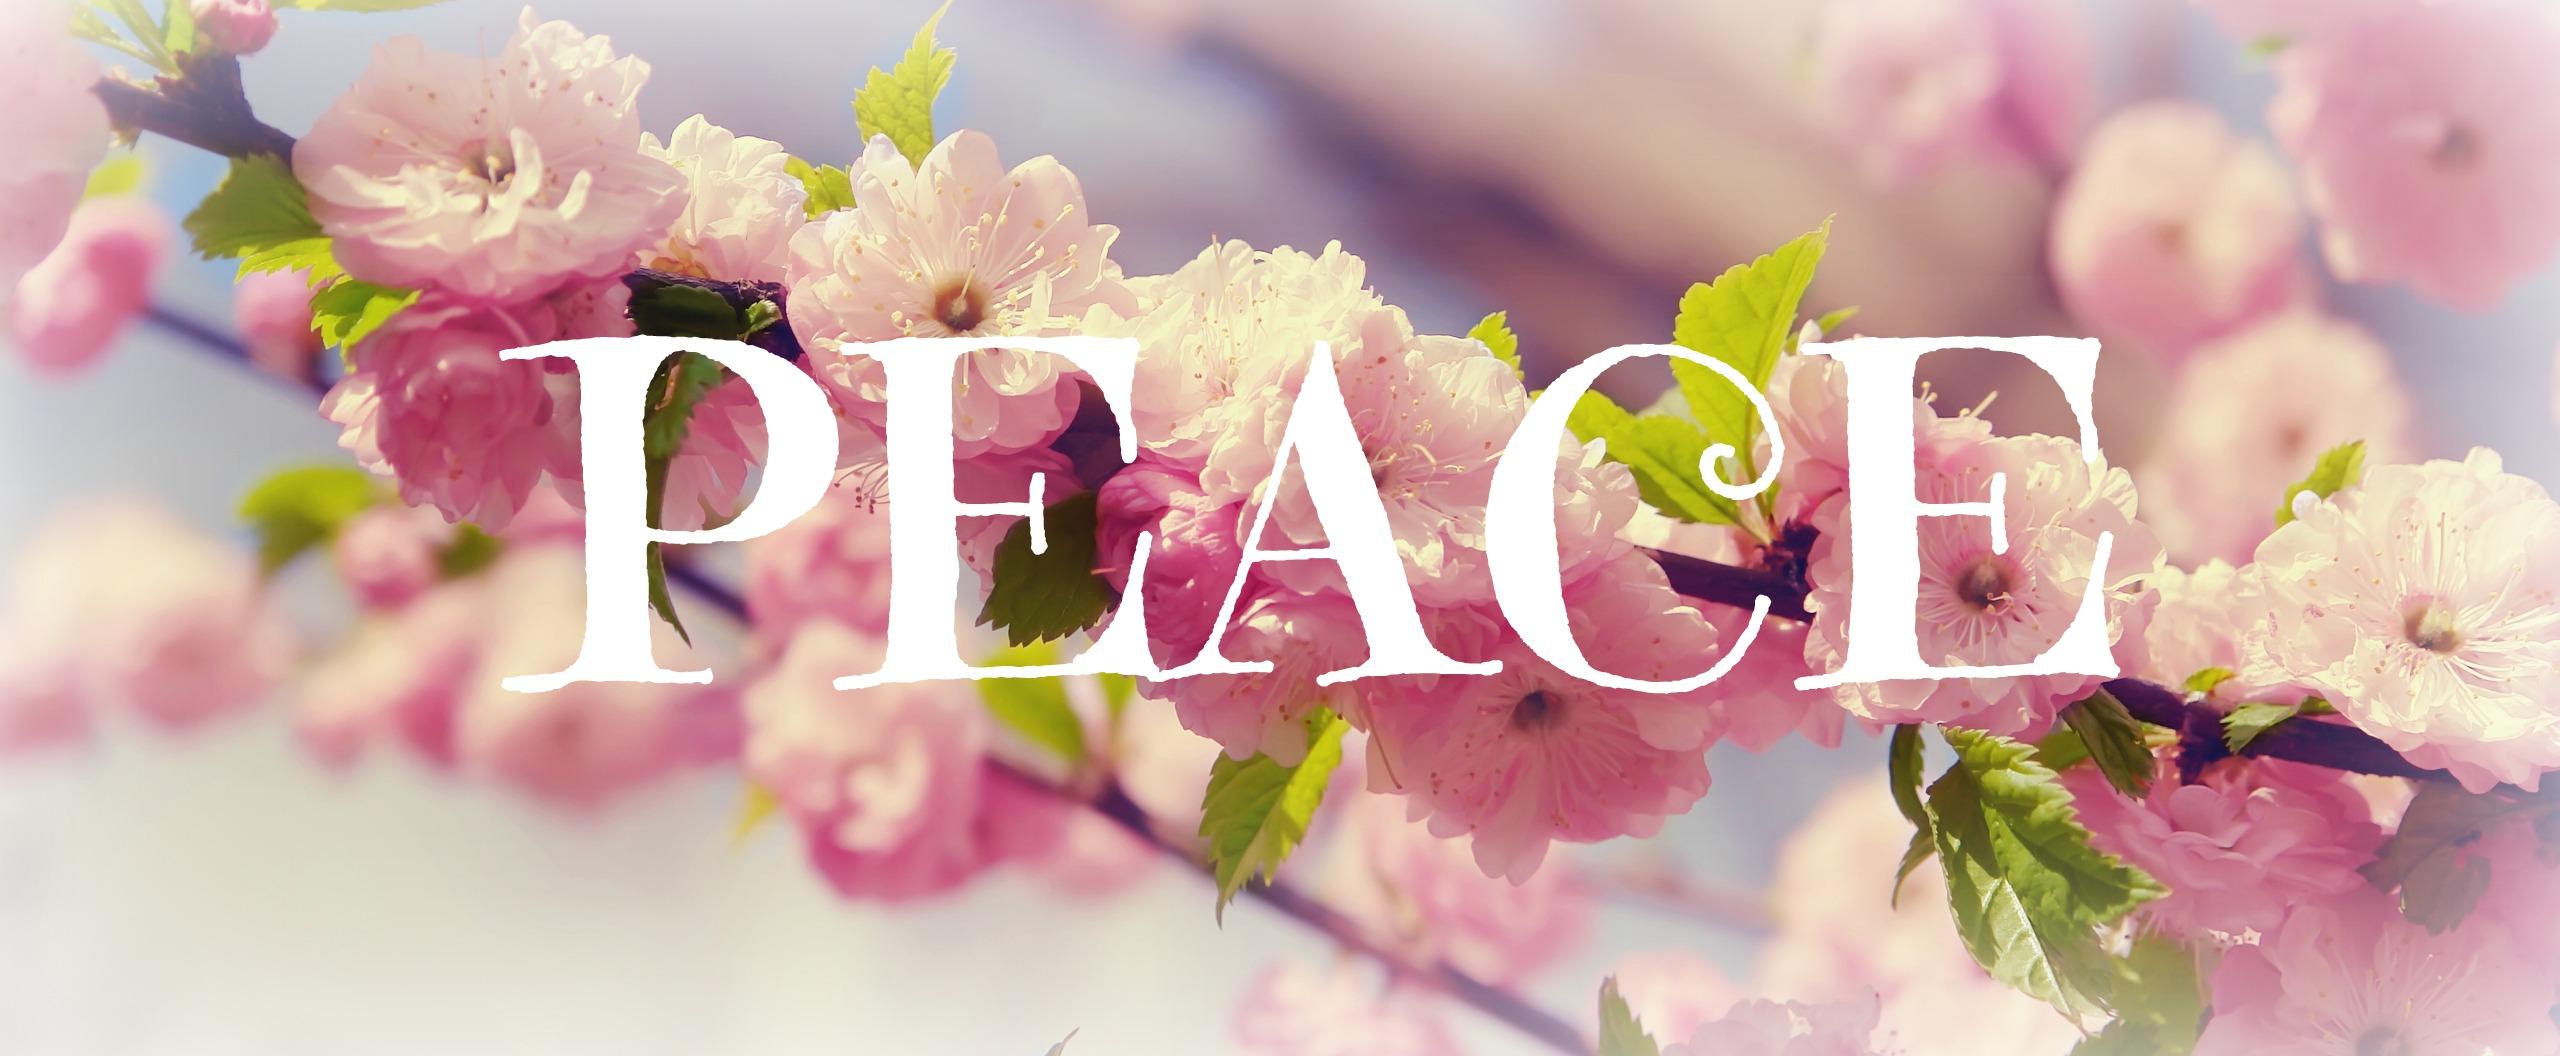 peace-wallpaper